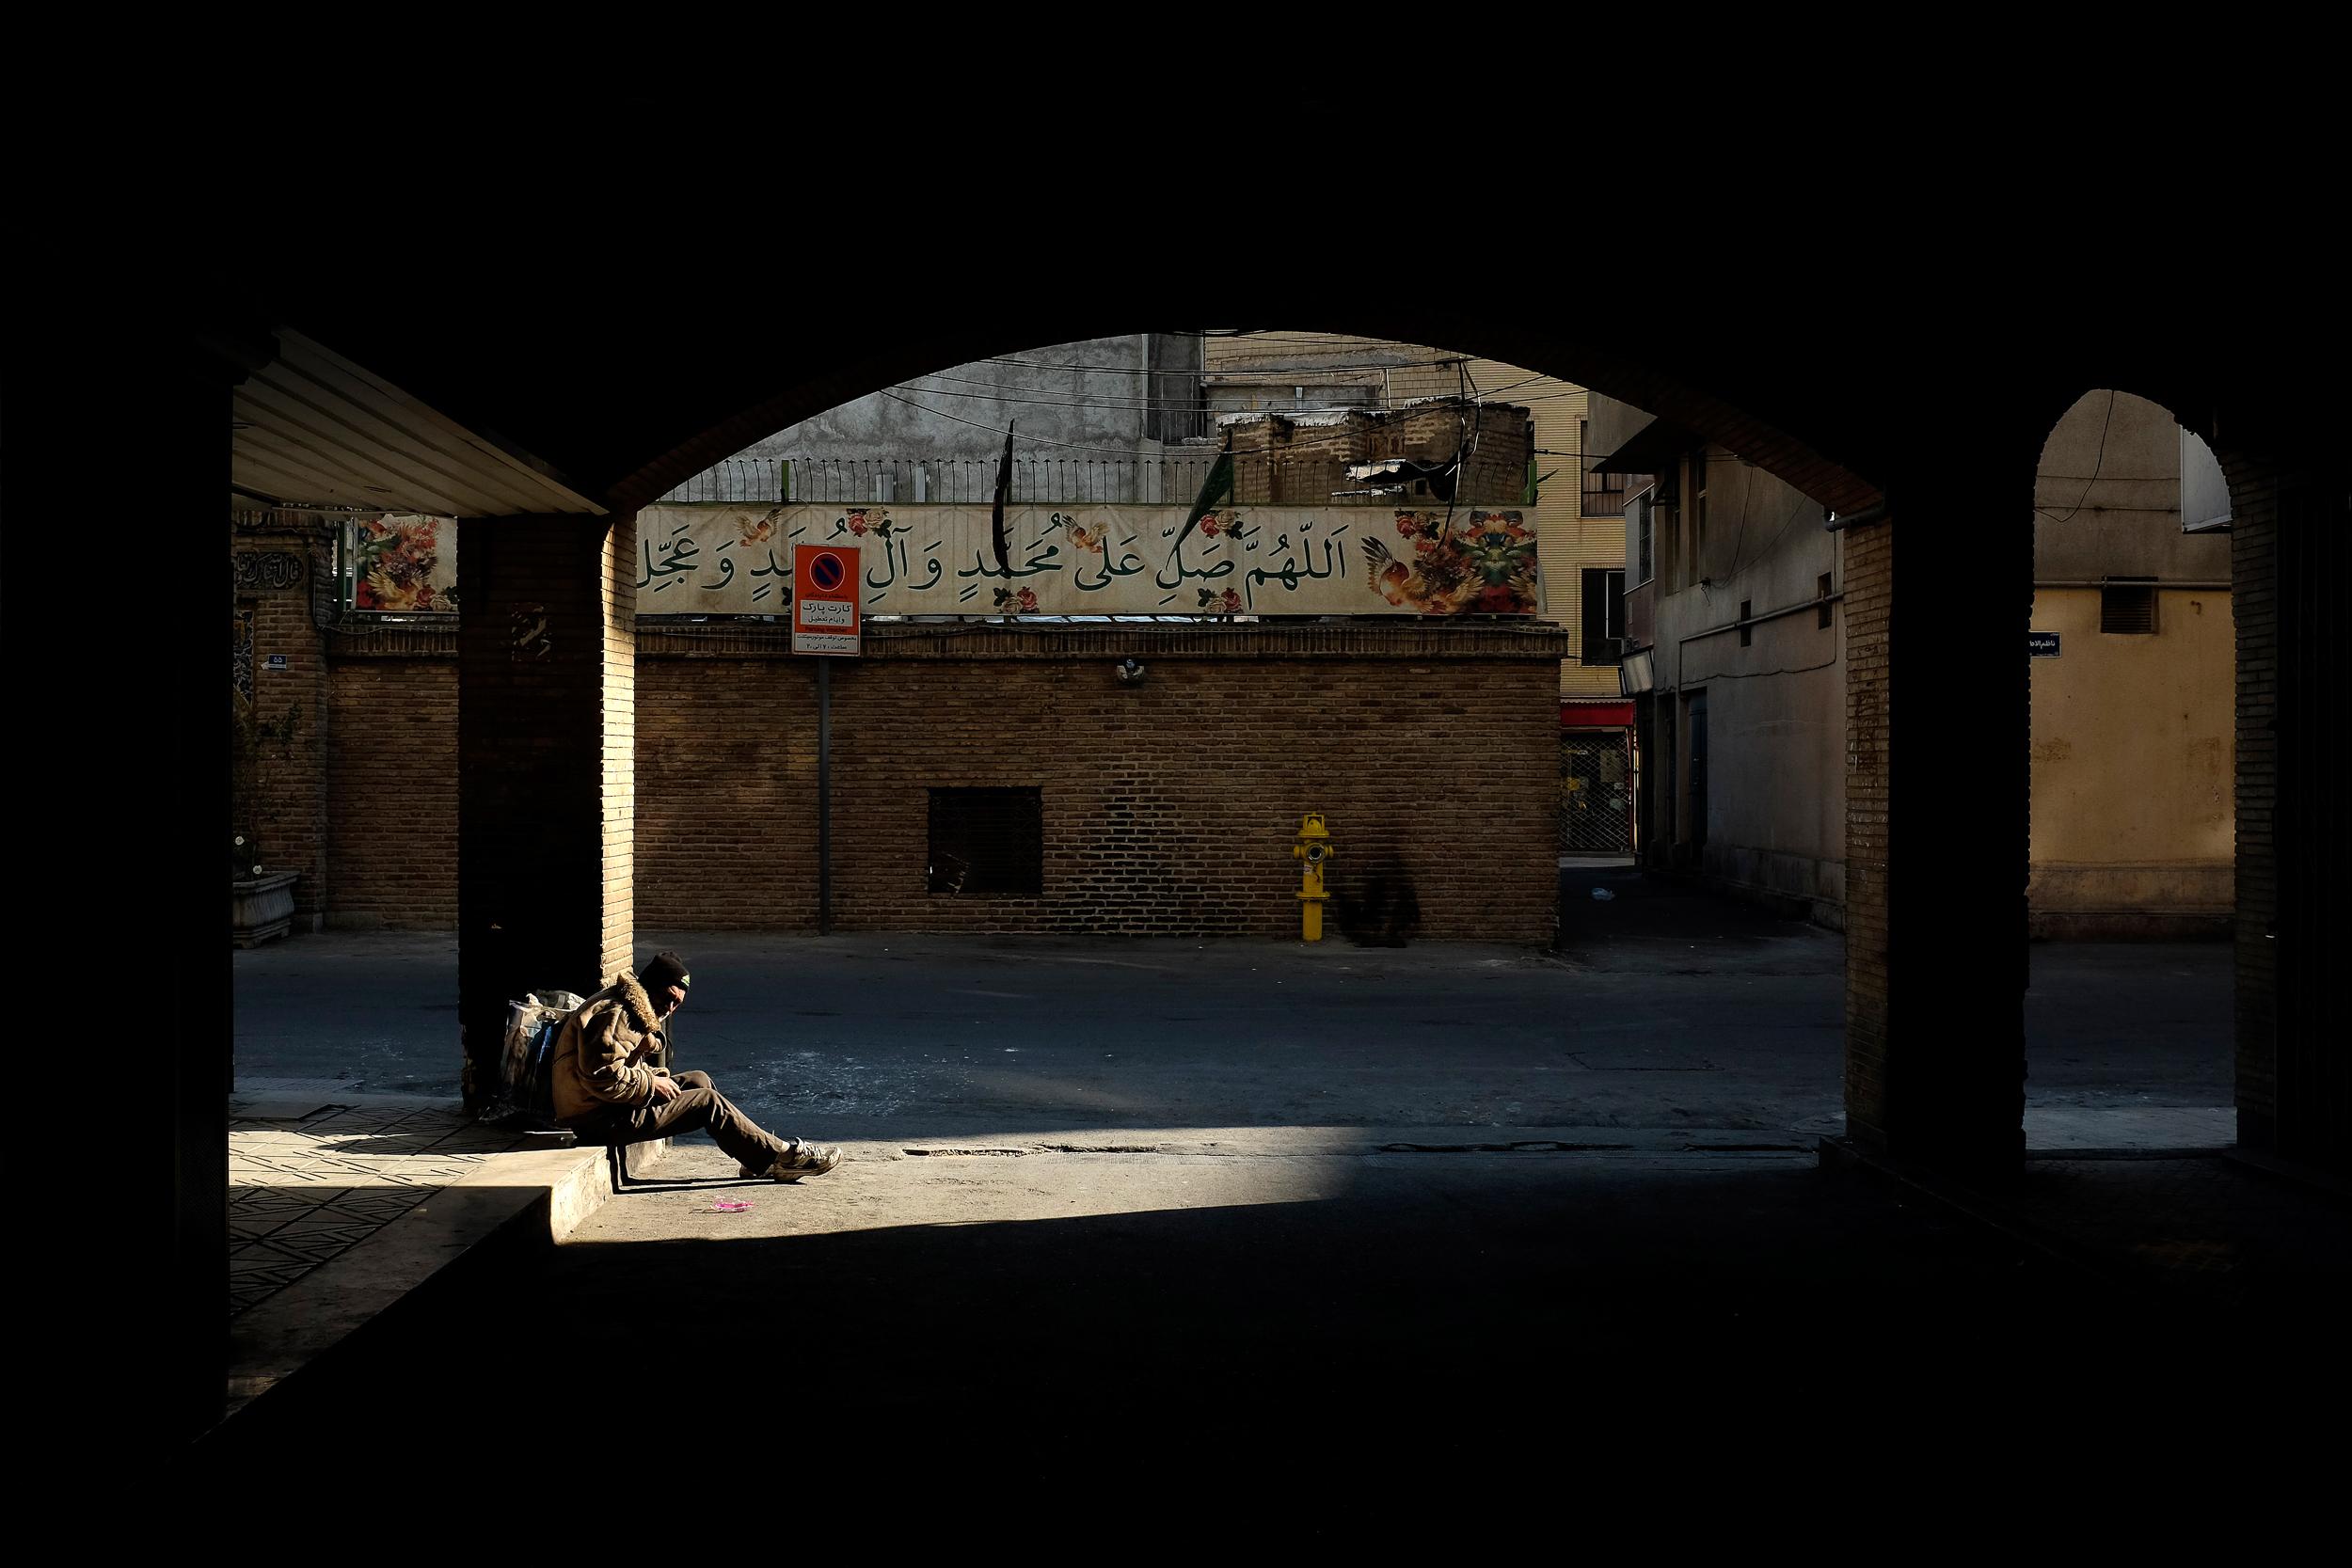 An addict is illuminated by the sun under a bridge in Central Tehran.